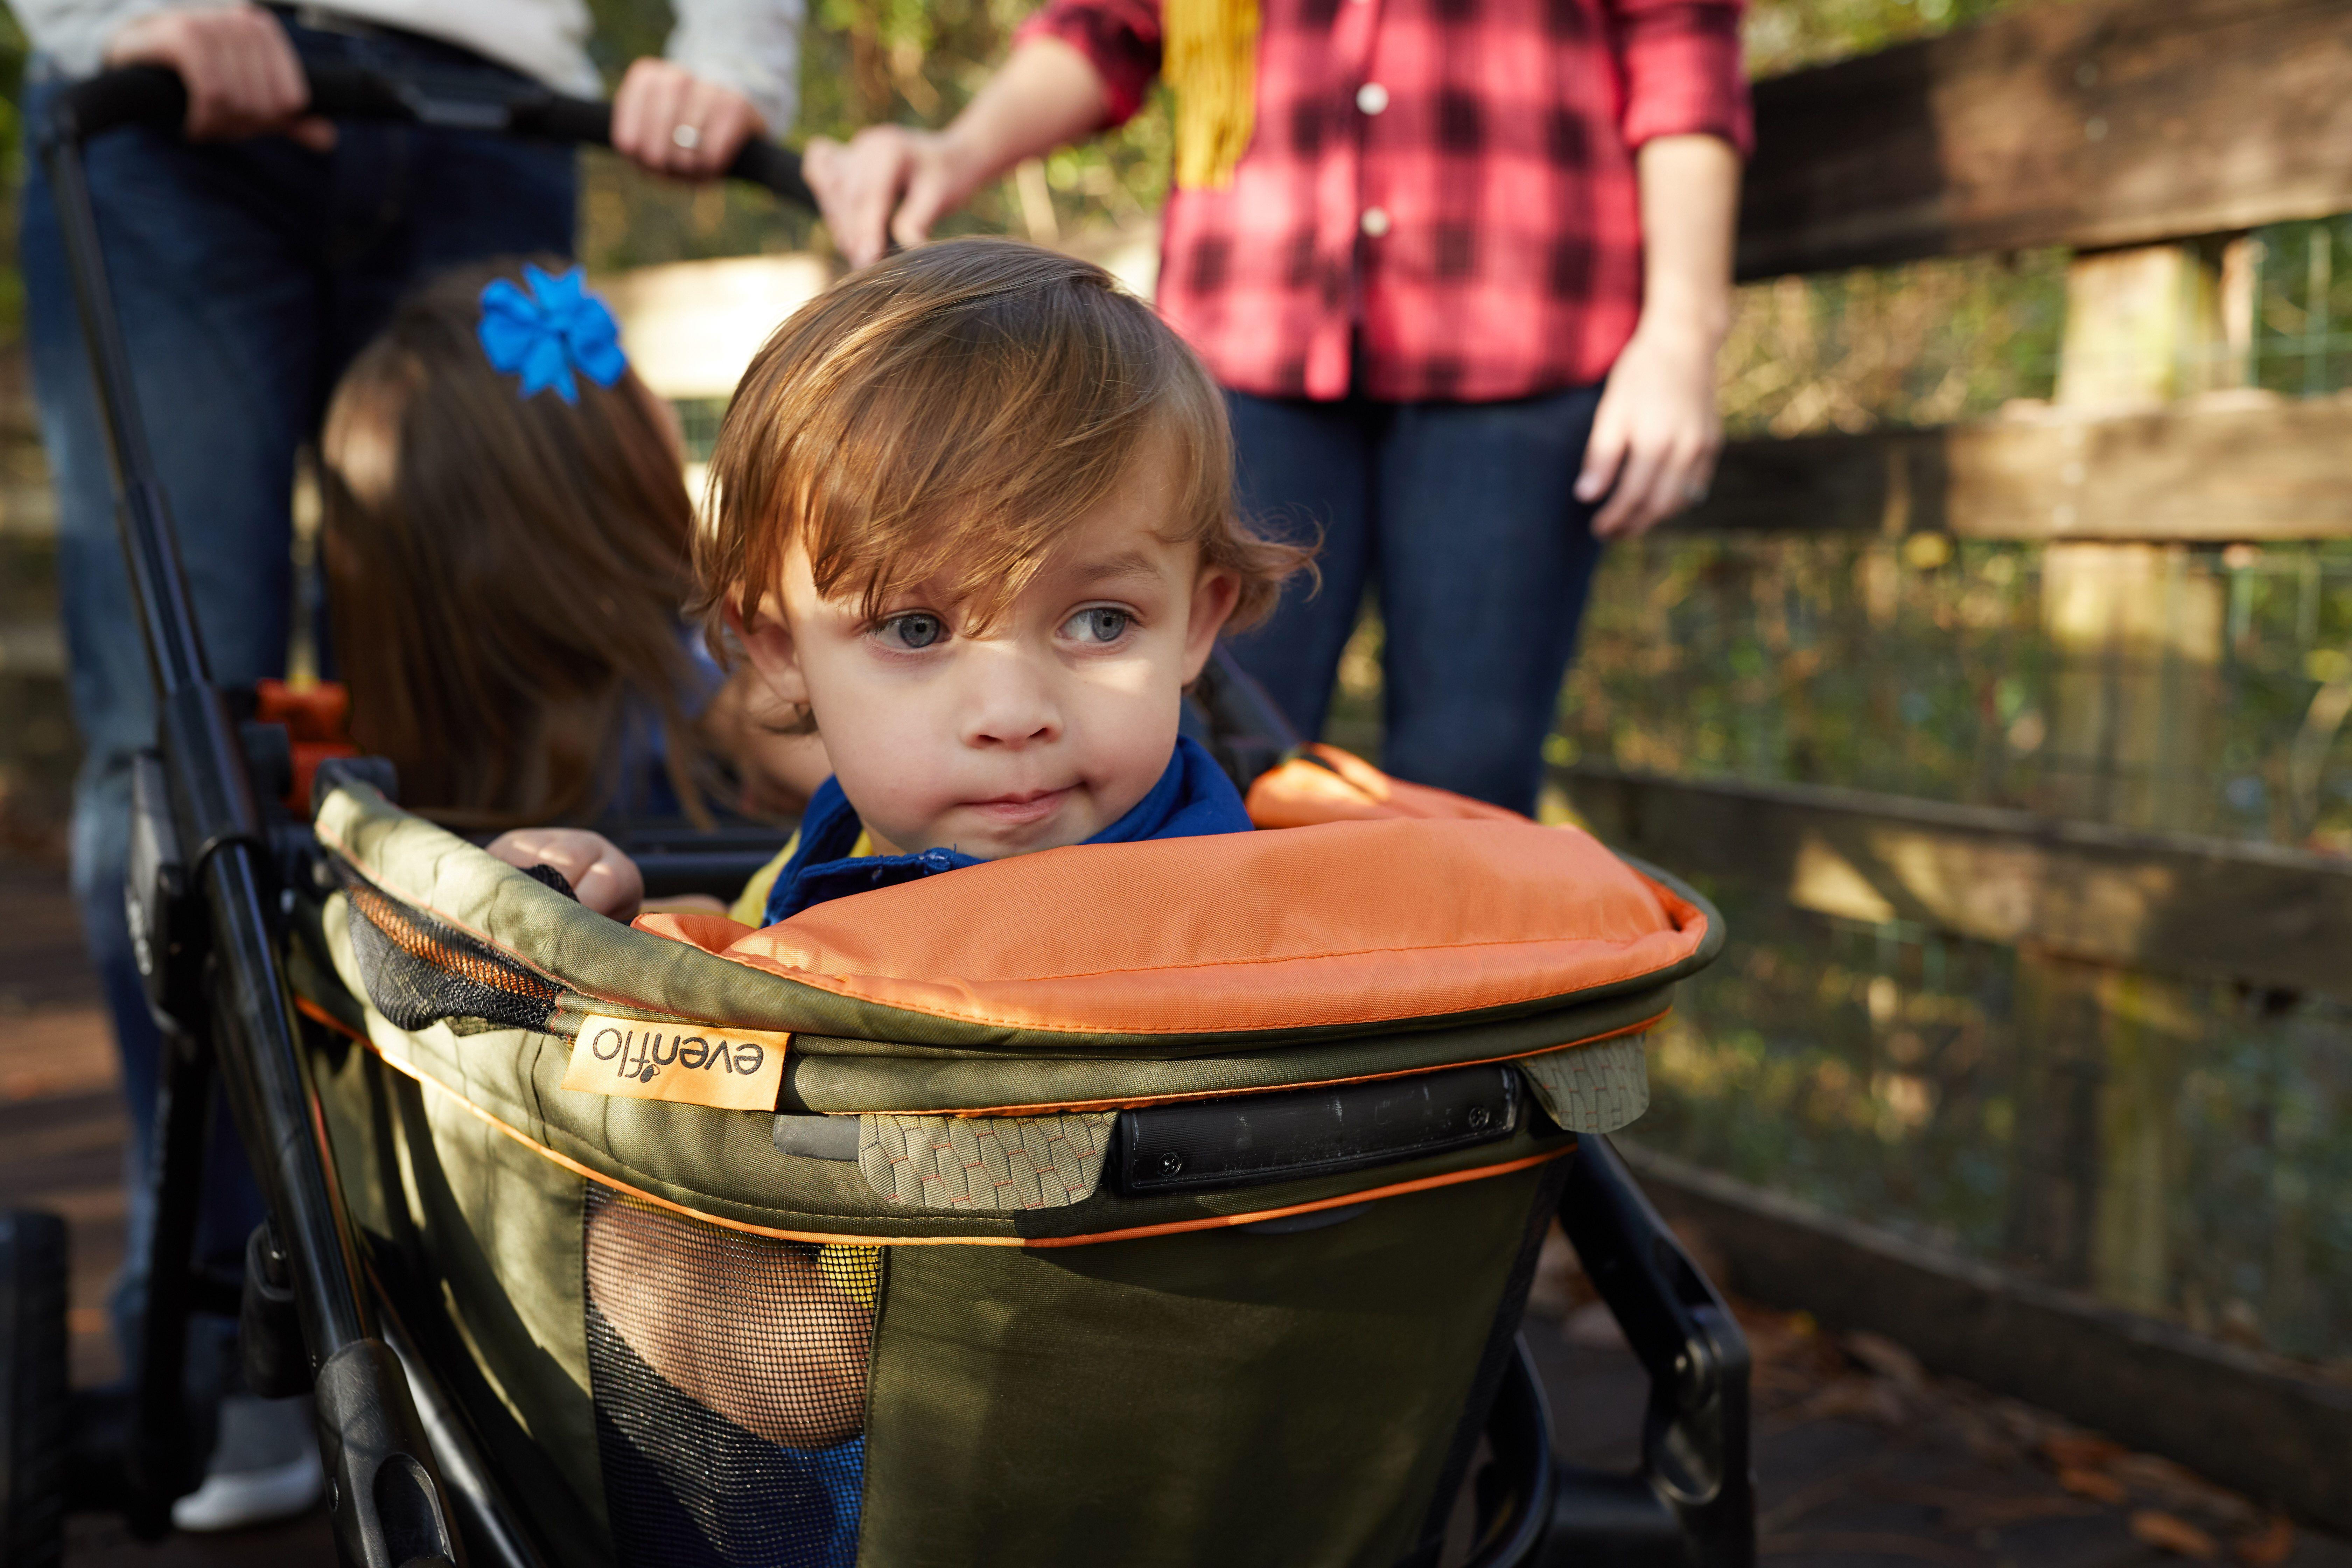 Pivot Xpand Modular Travel System with SafeMax Infant Car